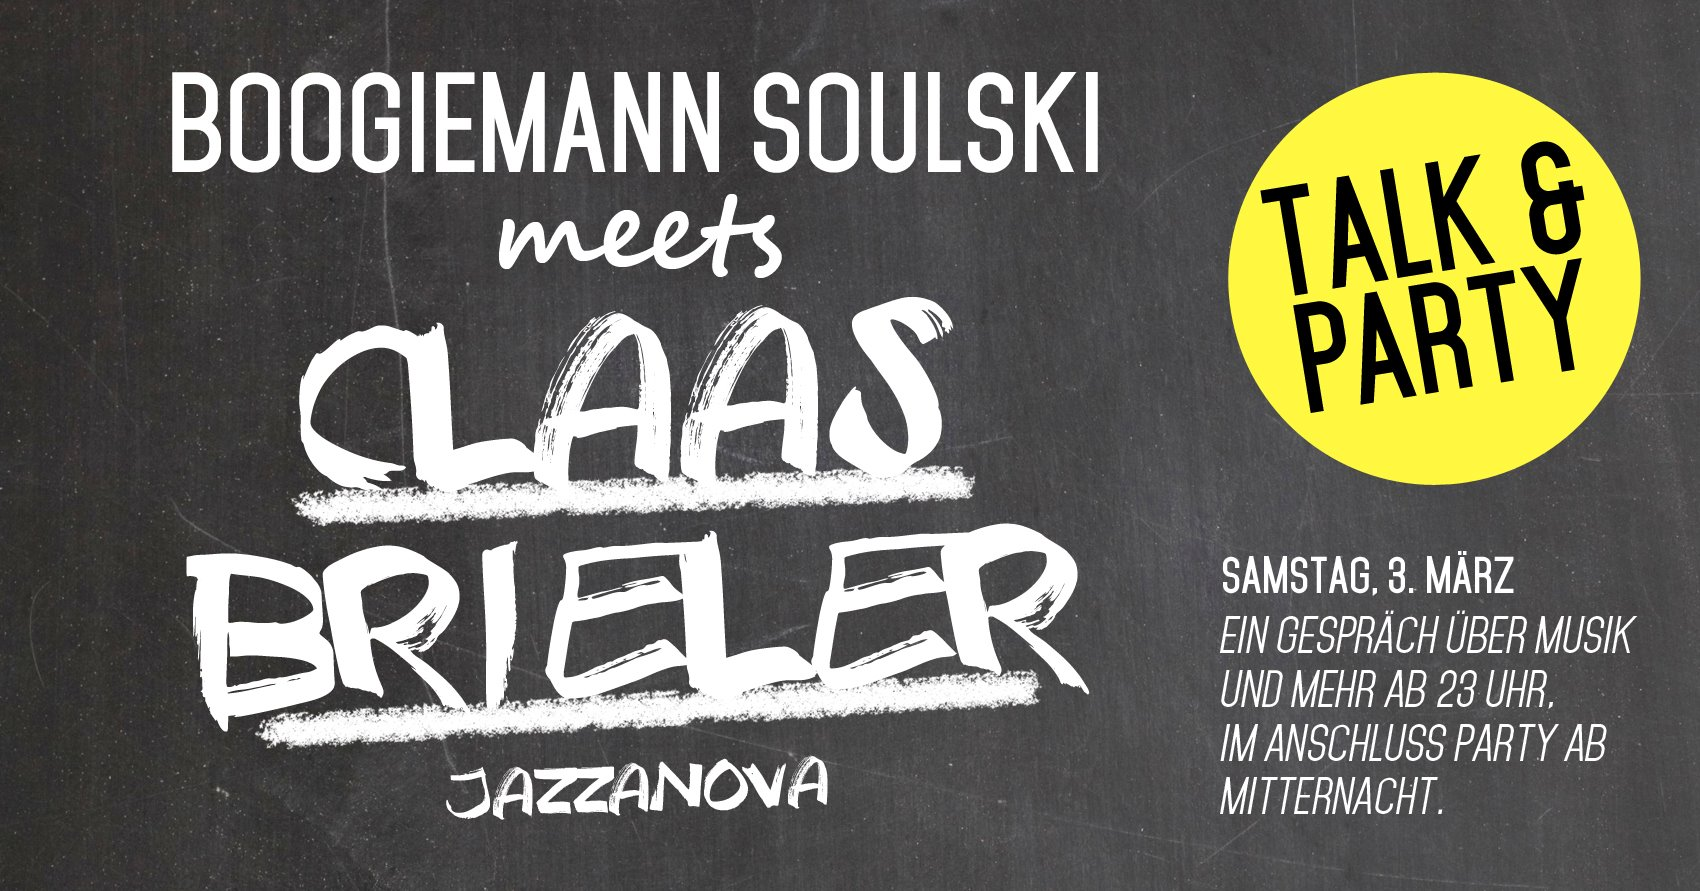 Boogiemann Soulski meets Claas Brieler